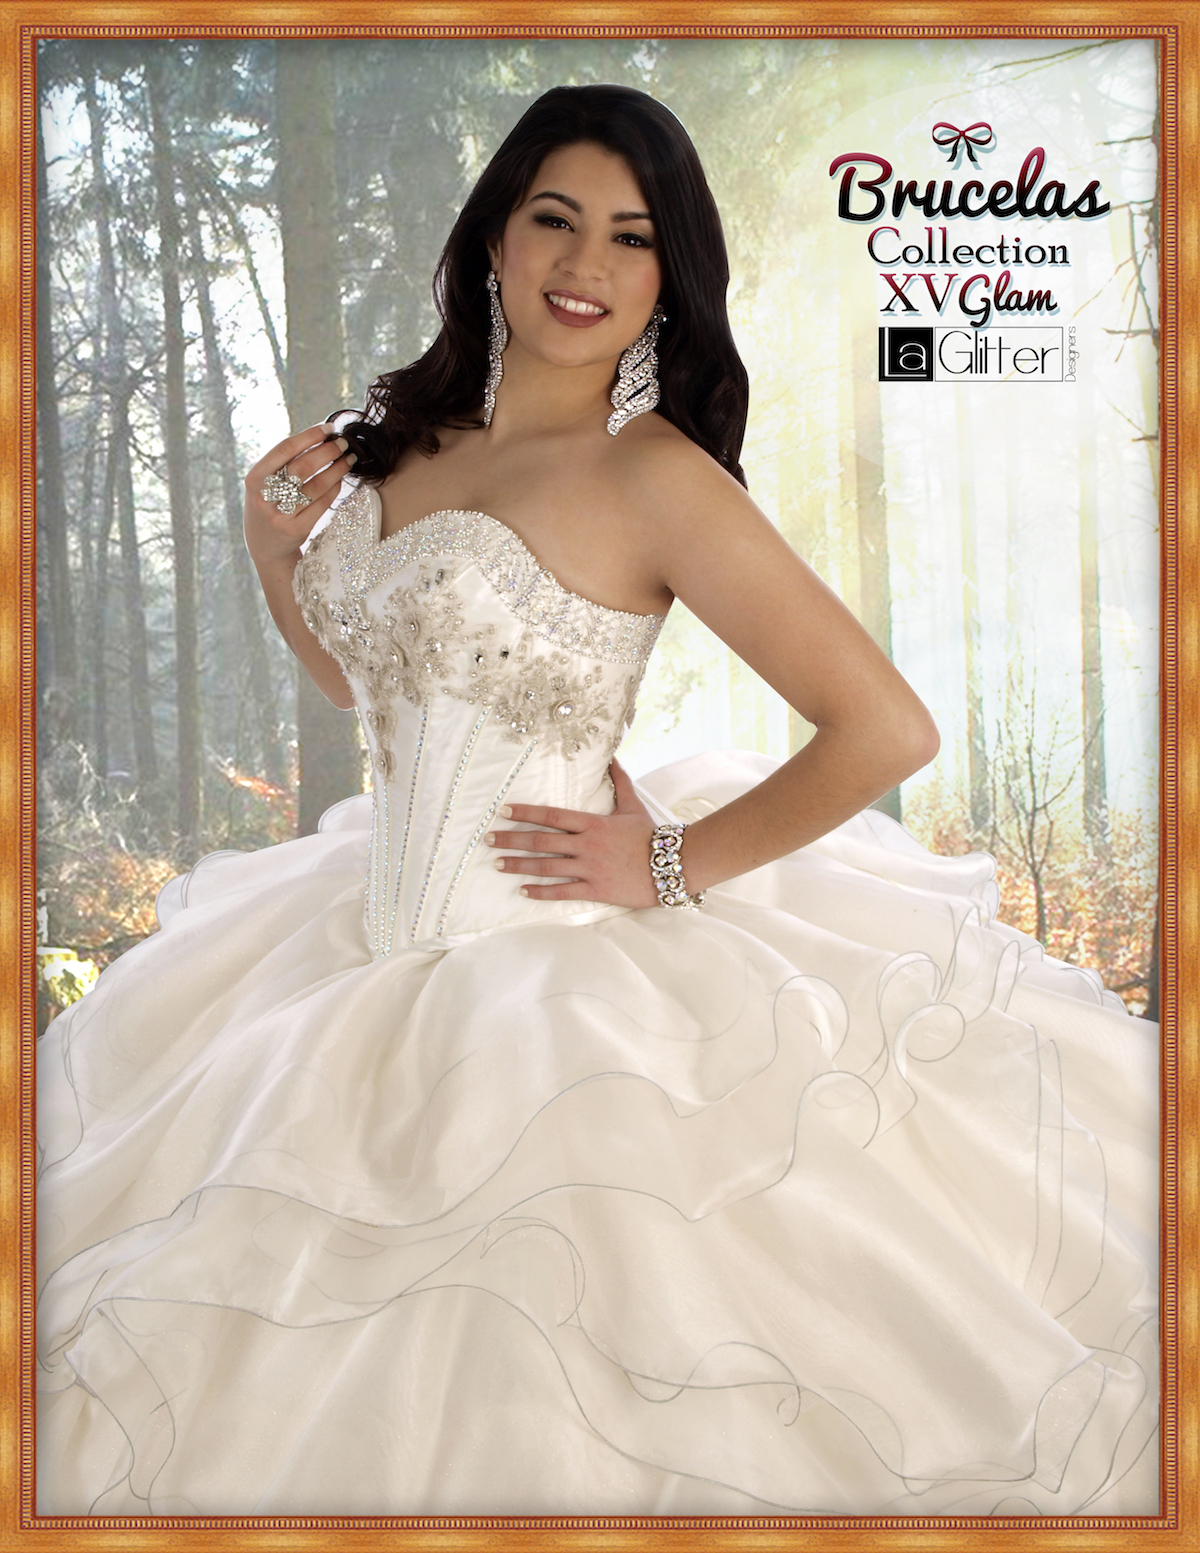 La Glitter Quinceanera Dresses Dallas | Quinceanera Dresses DFW | 15 ...